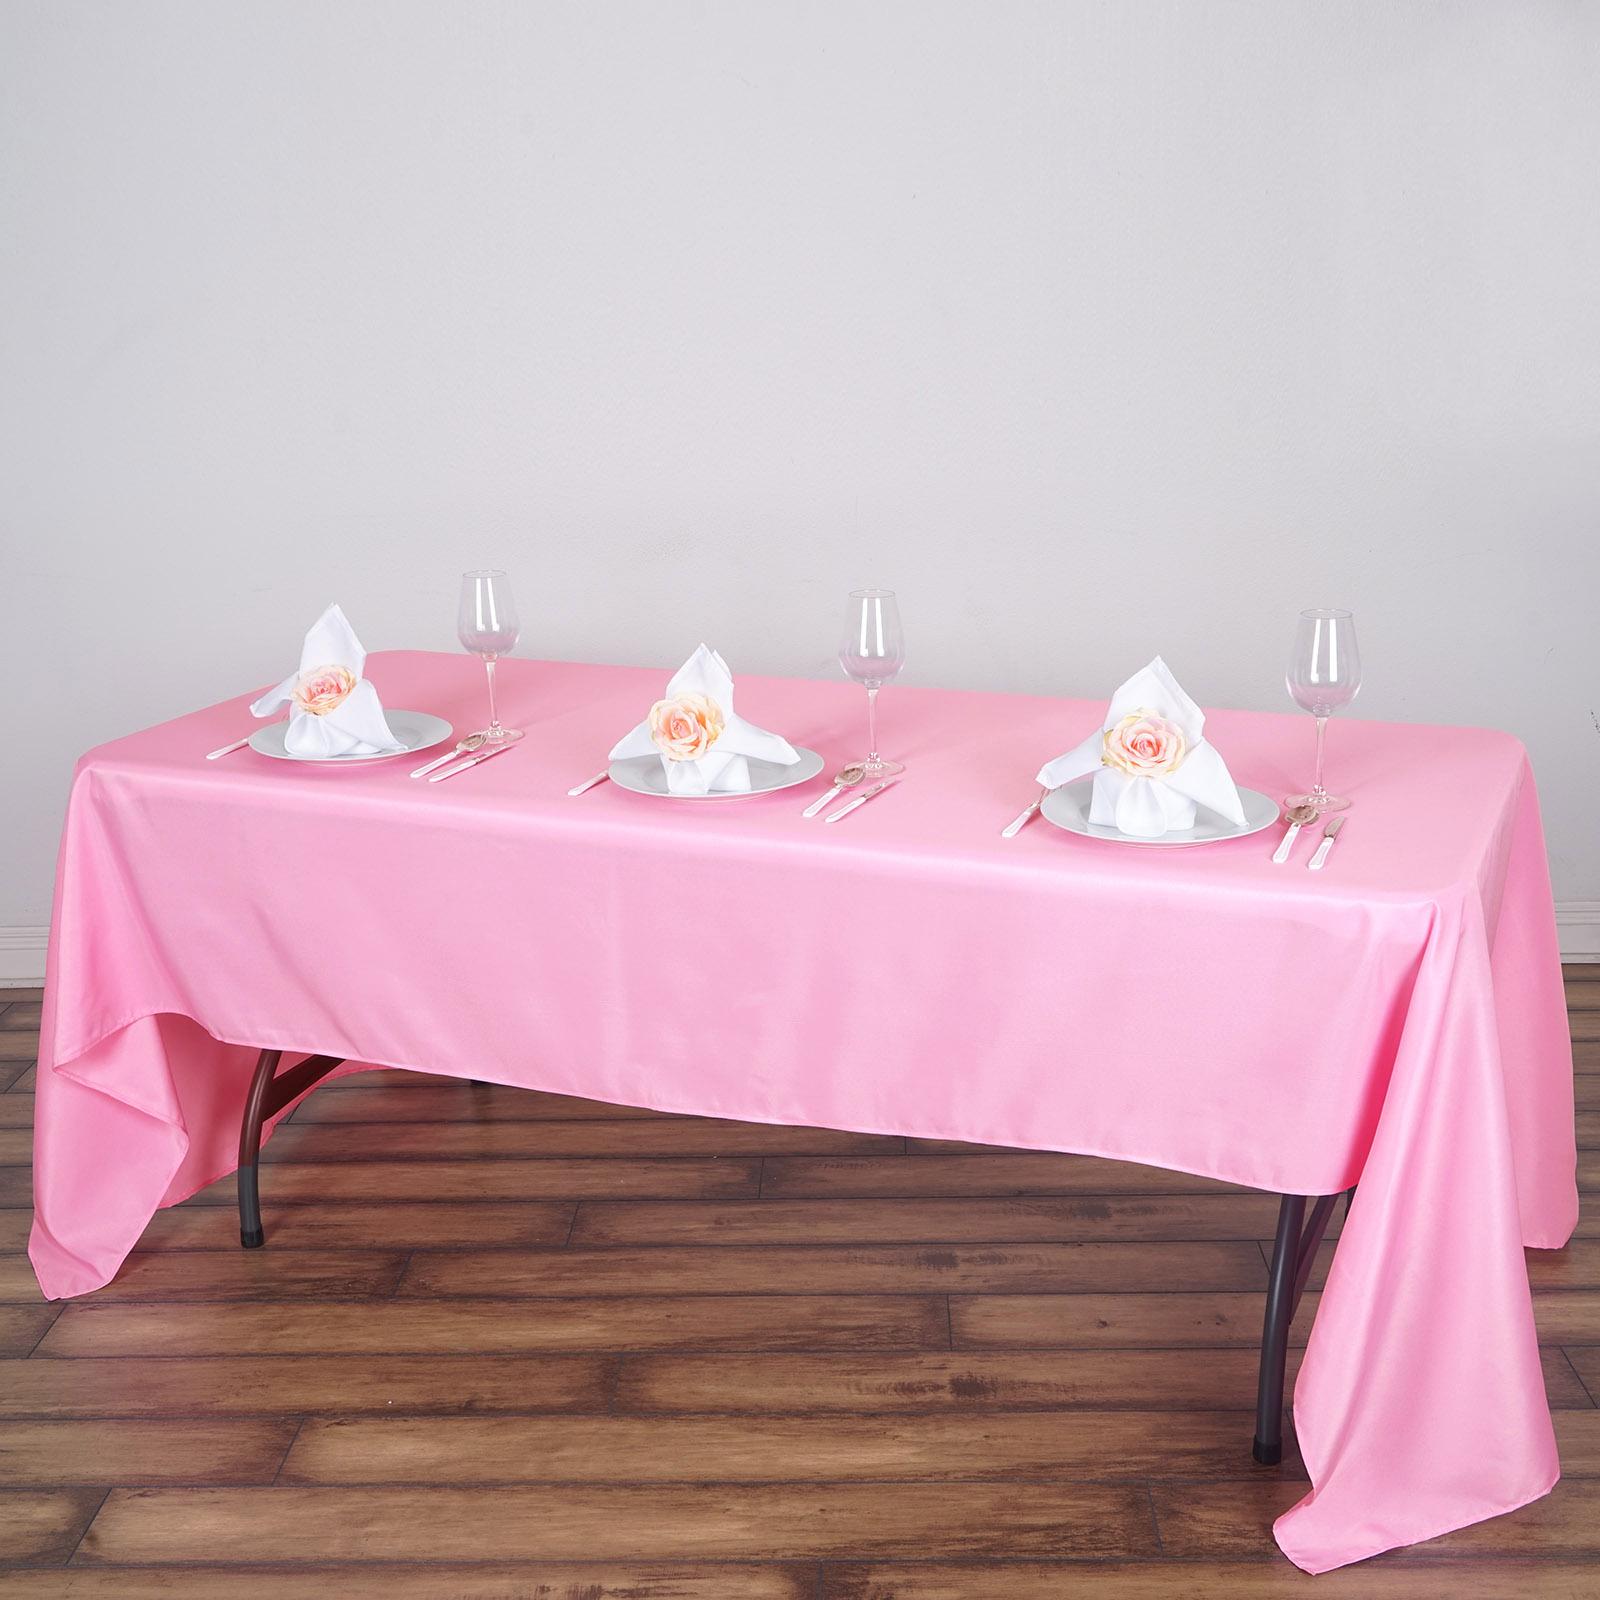 60 034 X 126 034 Polyester Rectangular Tablecloth